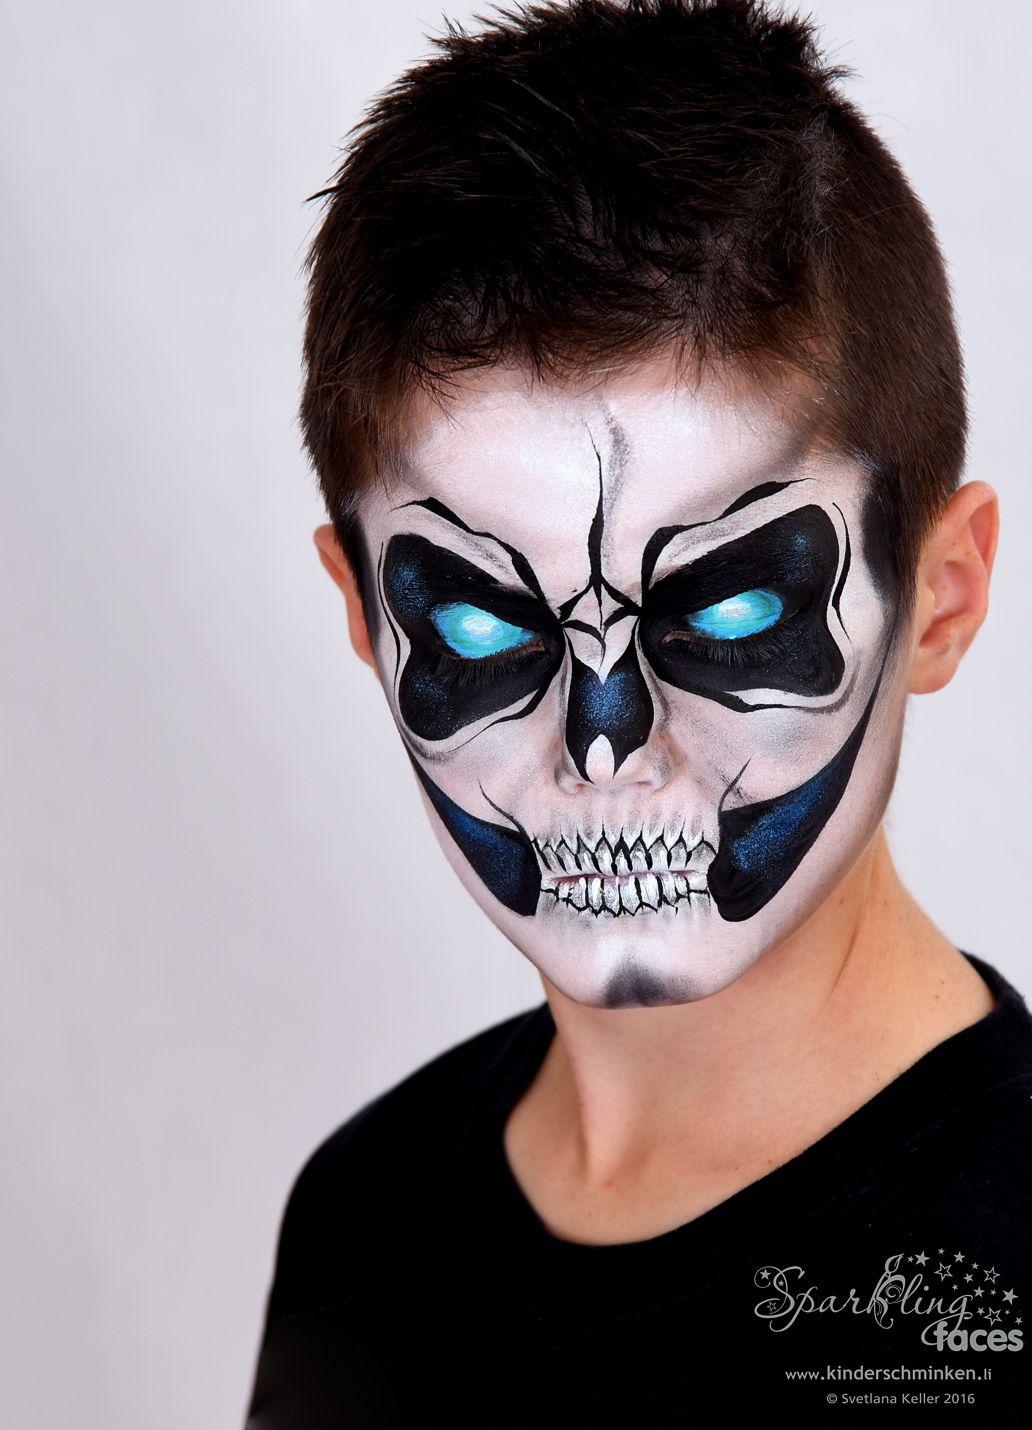 Www Kinderschminken Li Kinderschminken Kinderschminken Vorlagen Sc Maquillaje De Cara De Halloween Maquillaje De Superheroes Maquillaje De Fantasia Infantil